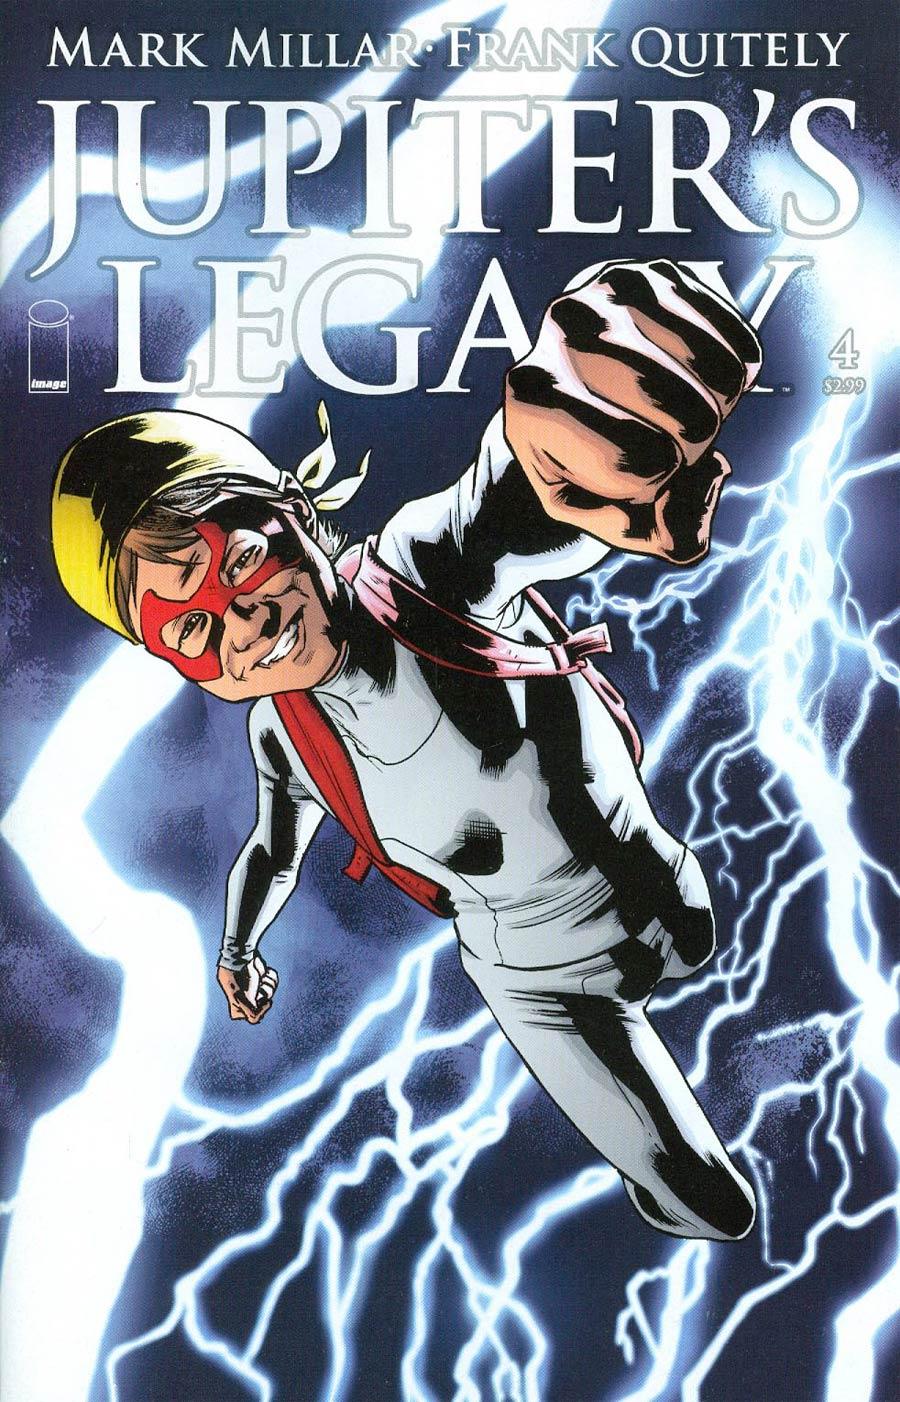 Jupiters Legacy #4 Cover B Bryan Hitch